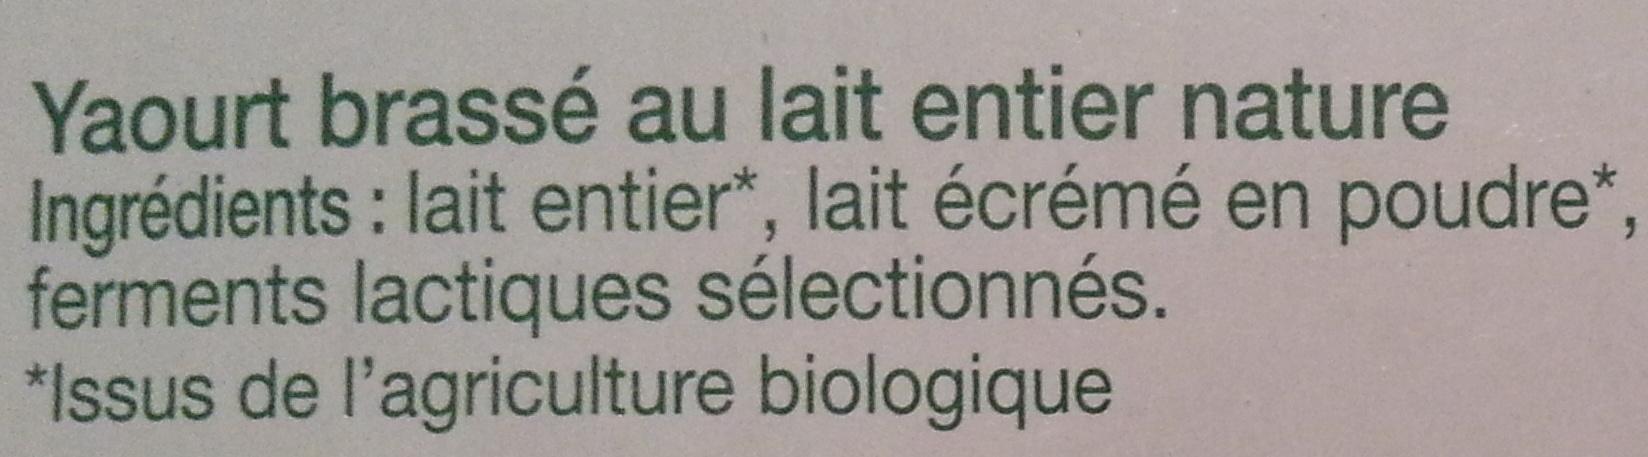 Yaourt brassé Nature - Ingredients